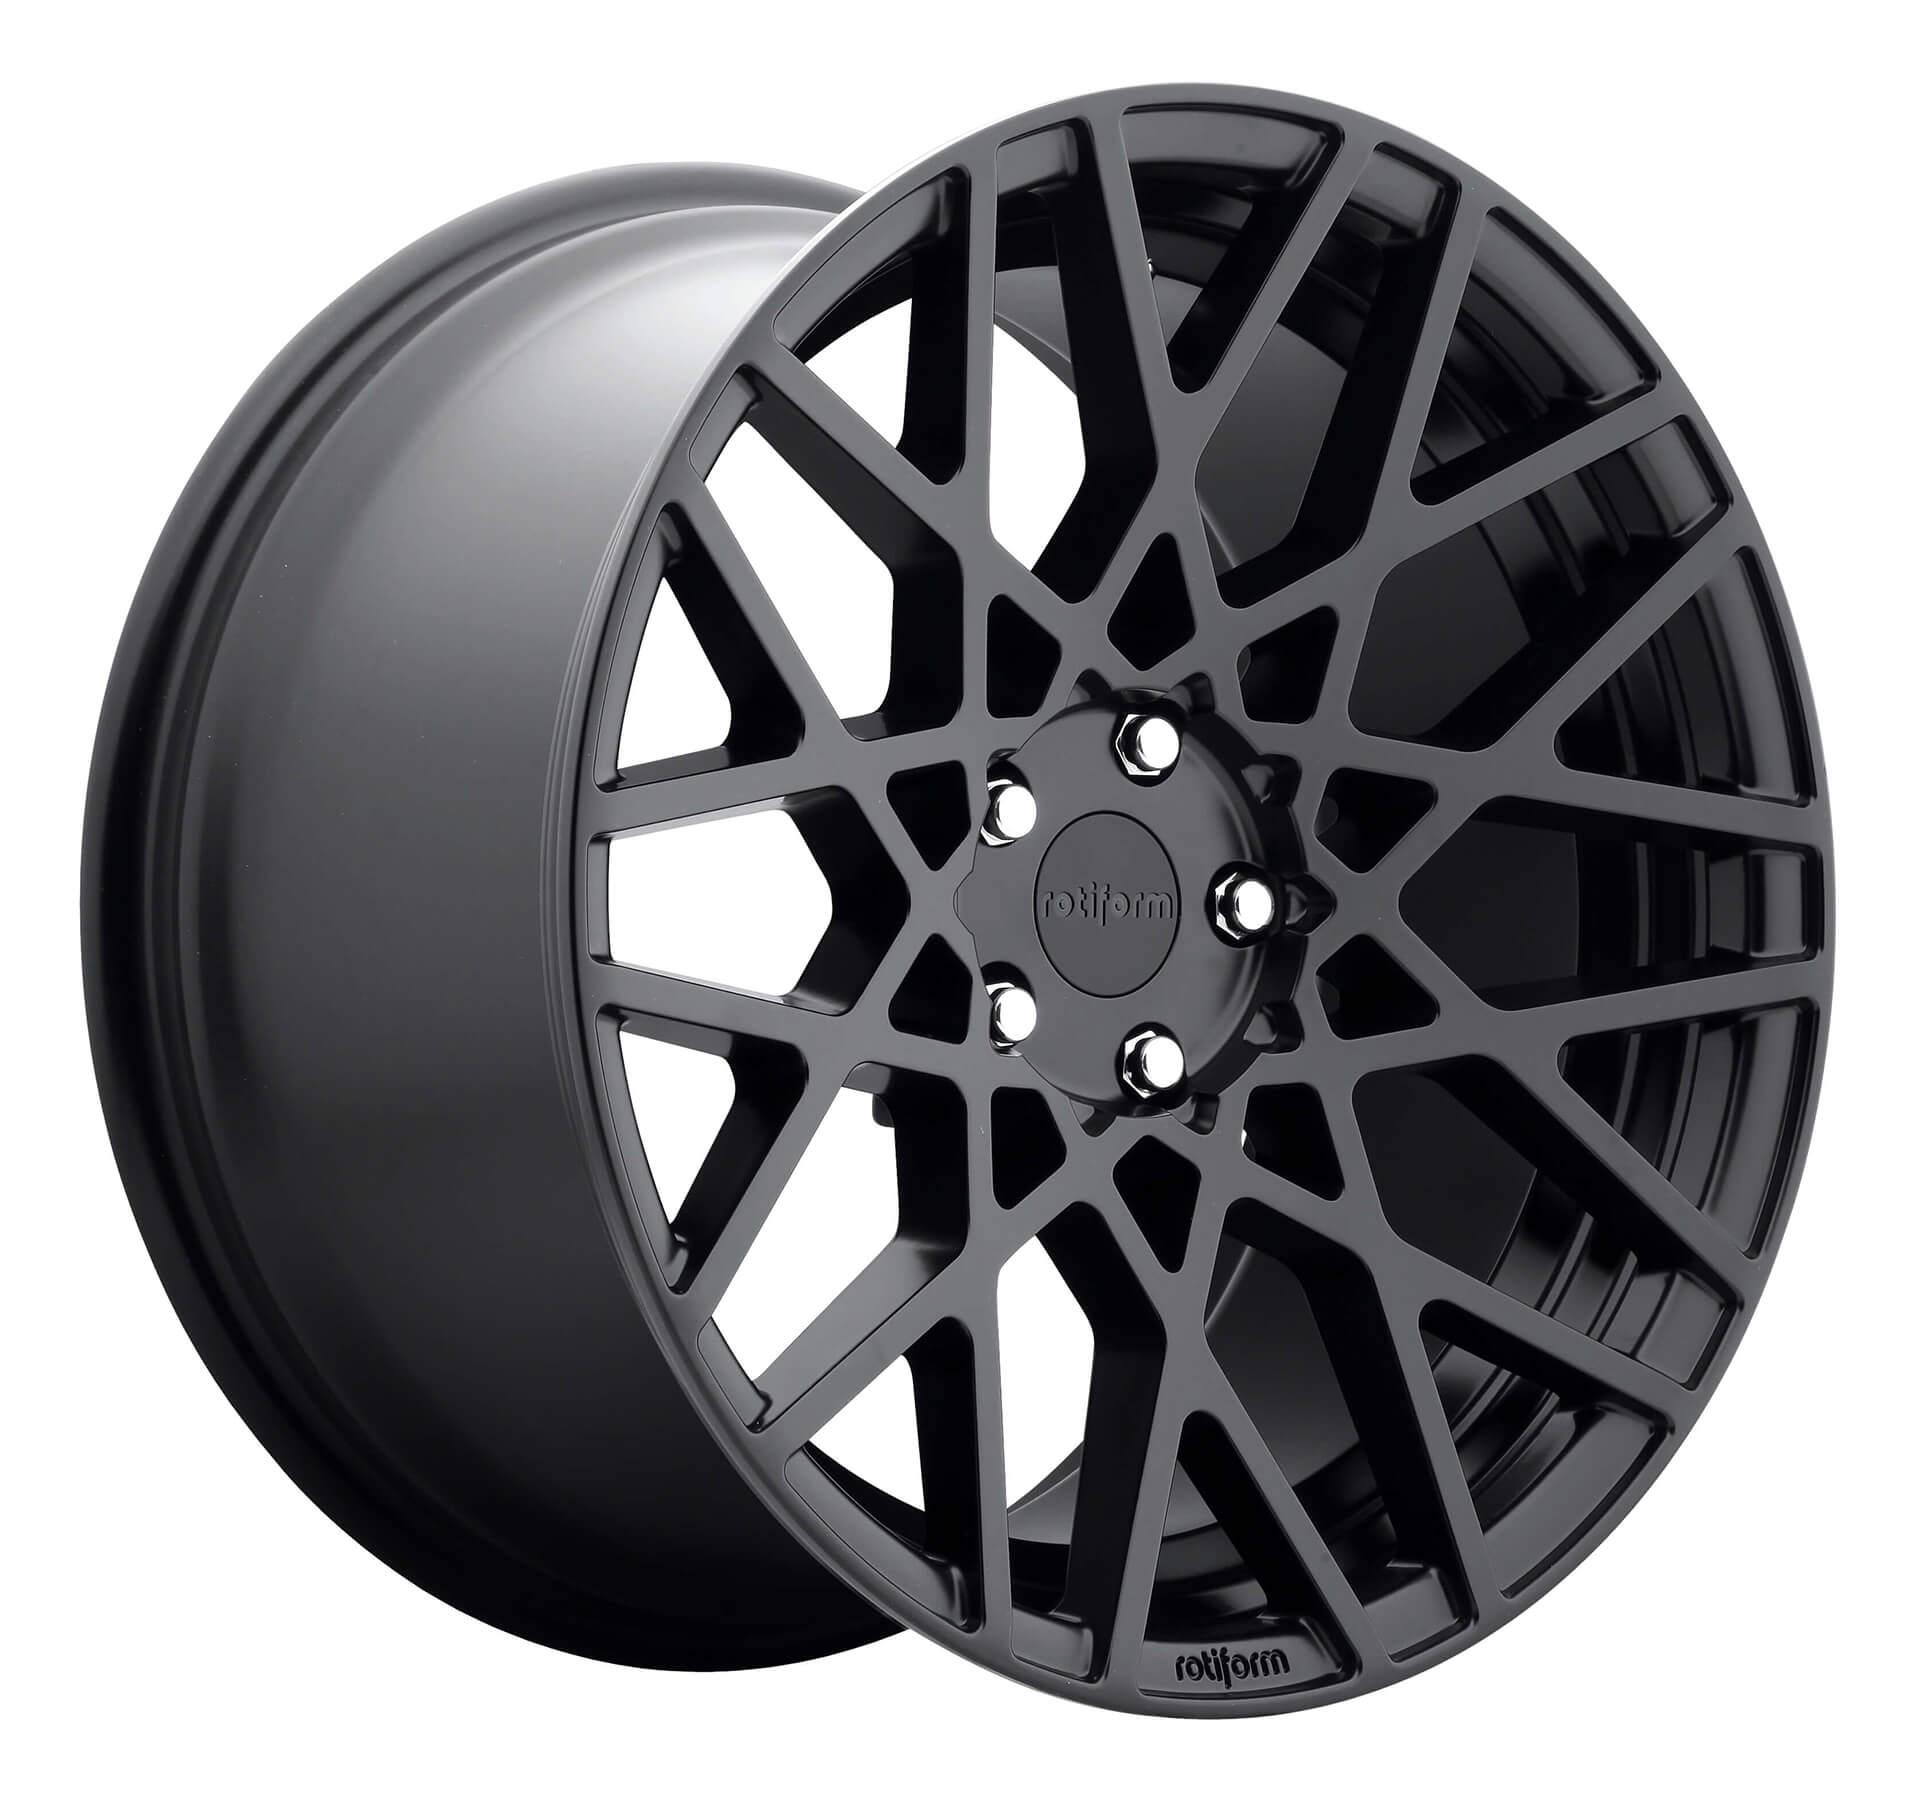 Rotiform Monoblock Wheel - BLQ Cast 1 Piece